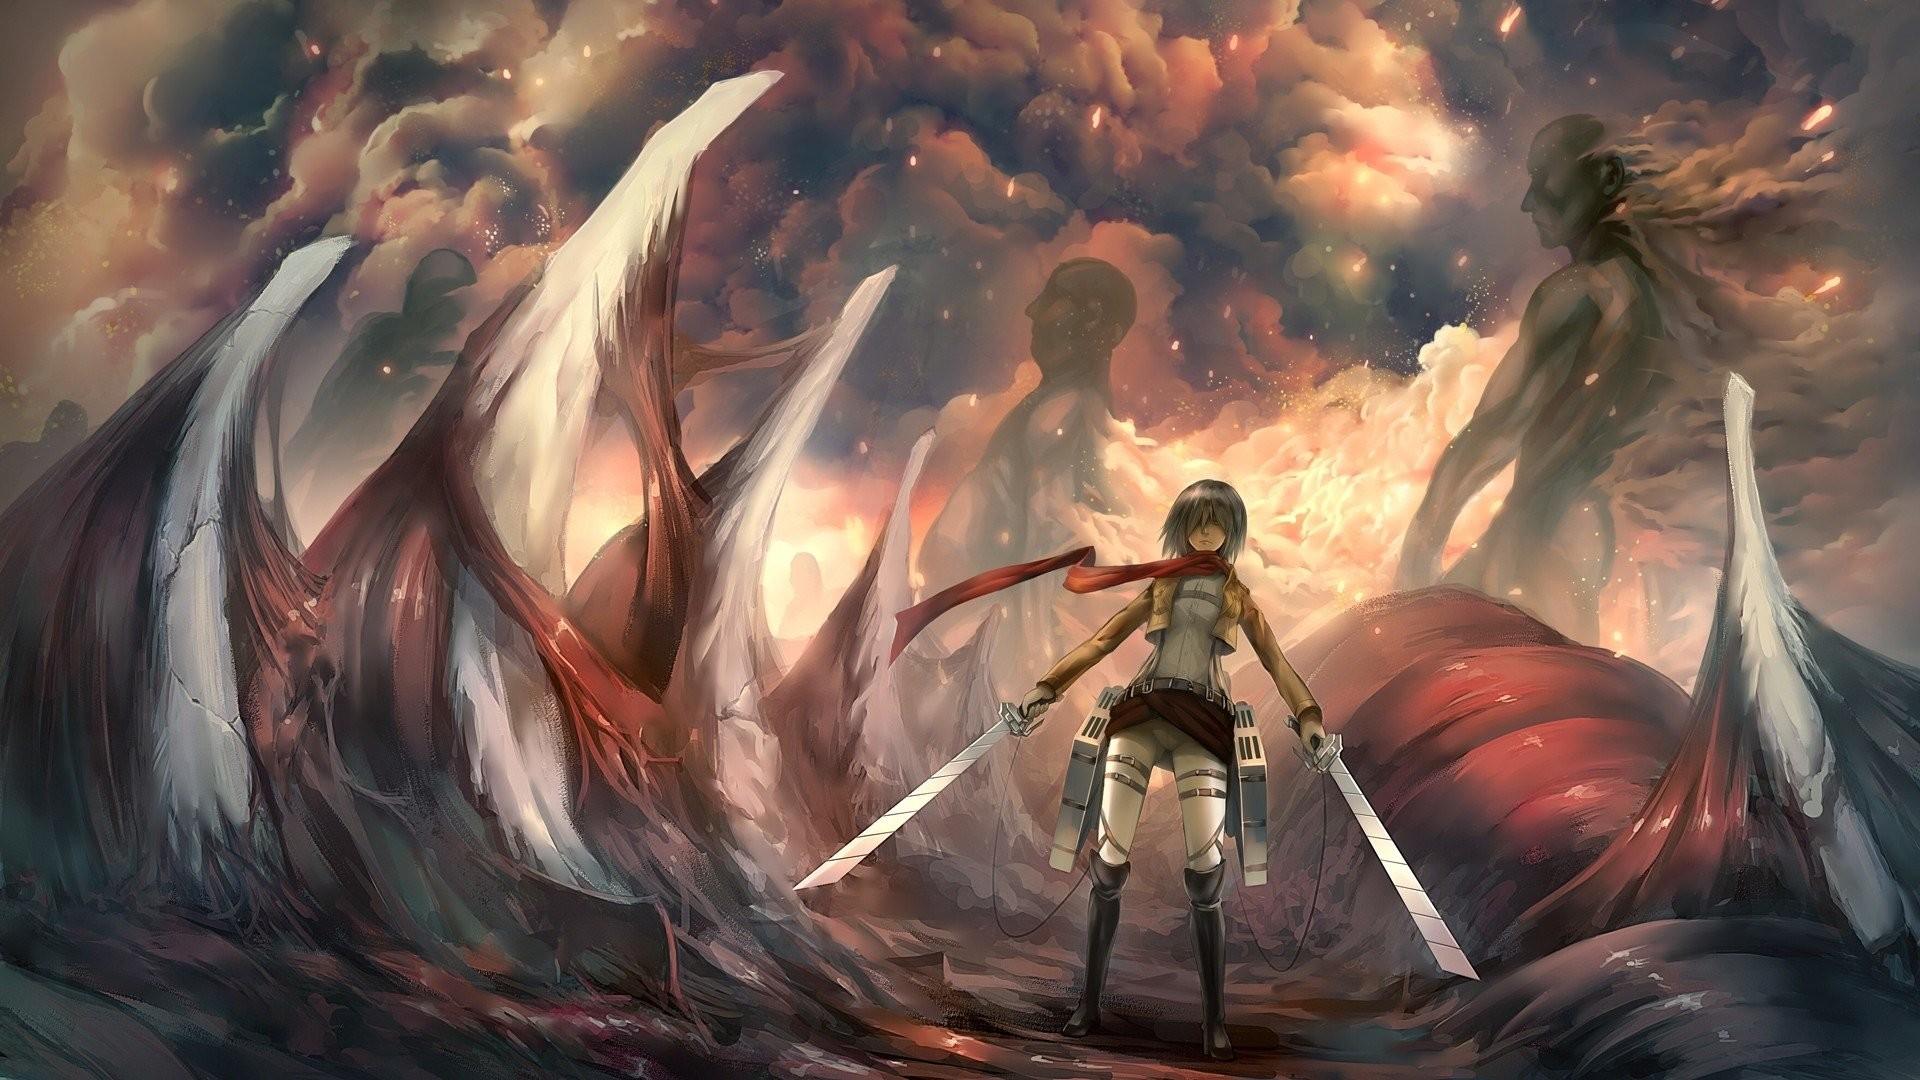 Wallpaper Shingeki no Kyojin FULL HD by Slifer on DeviantArt